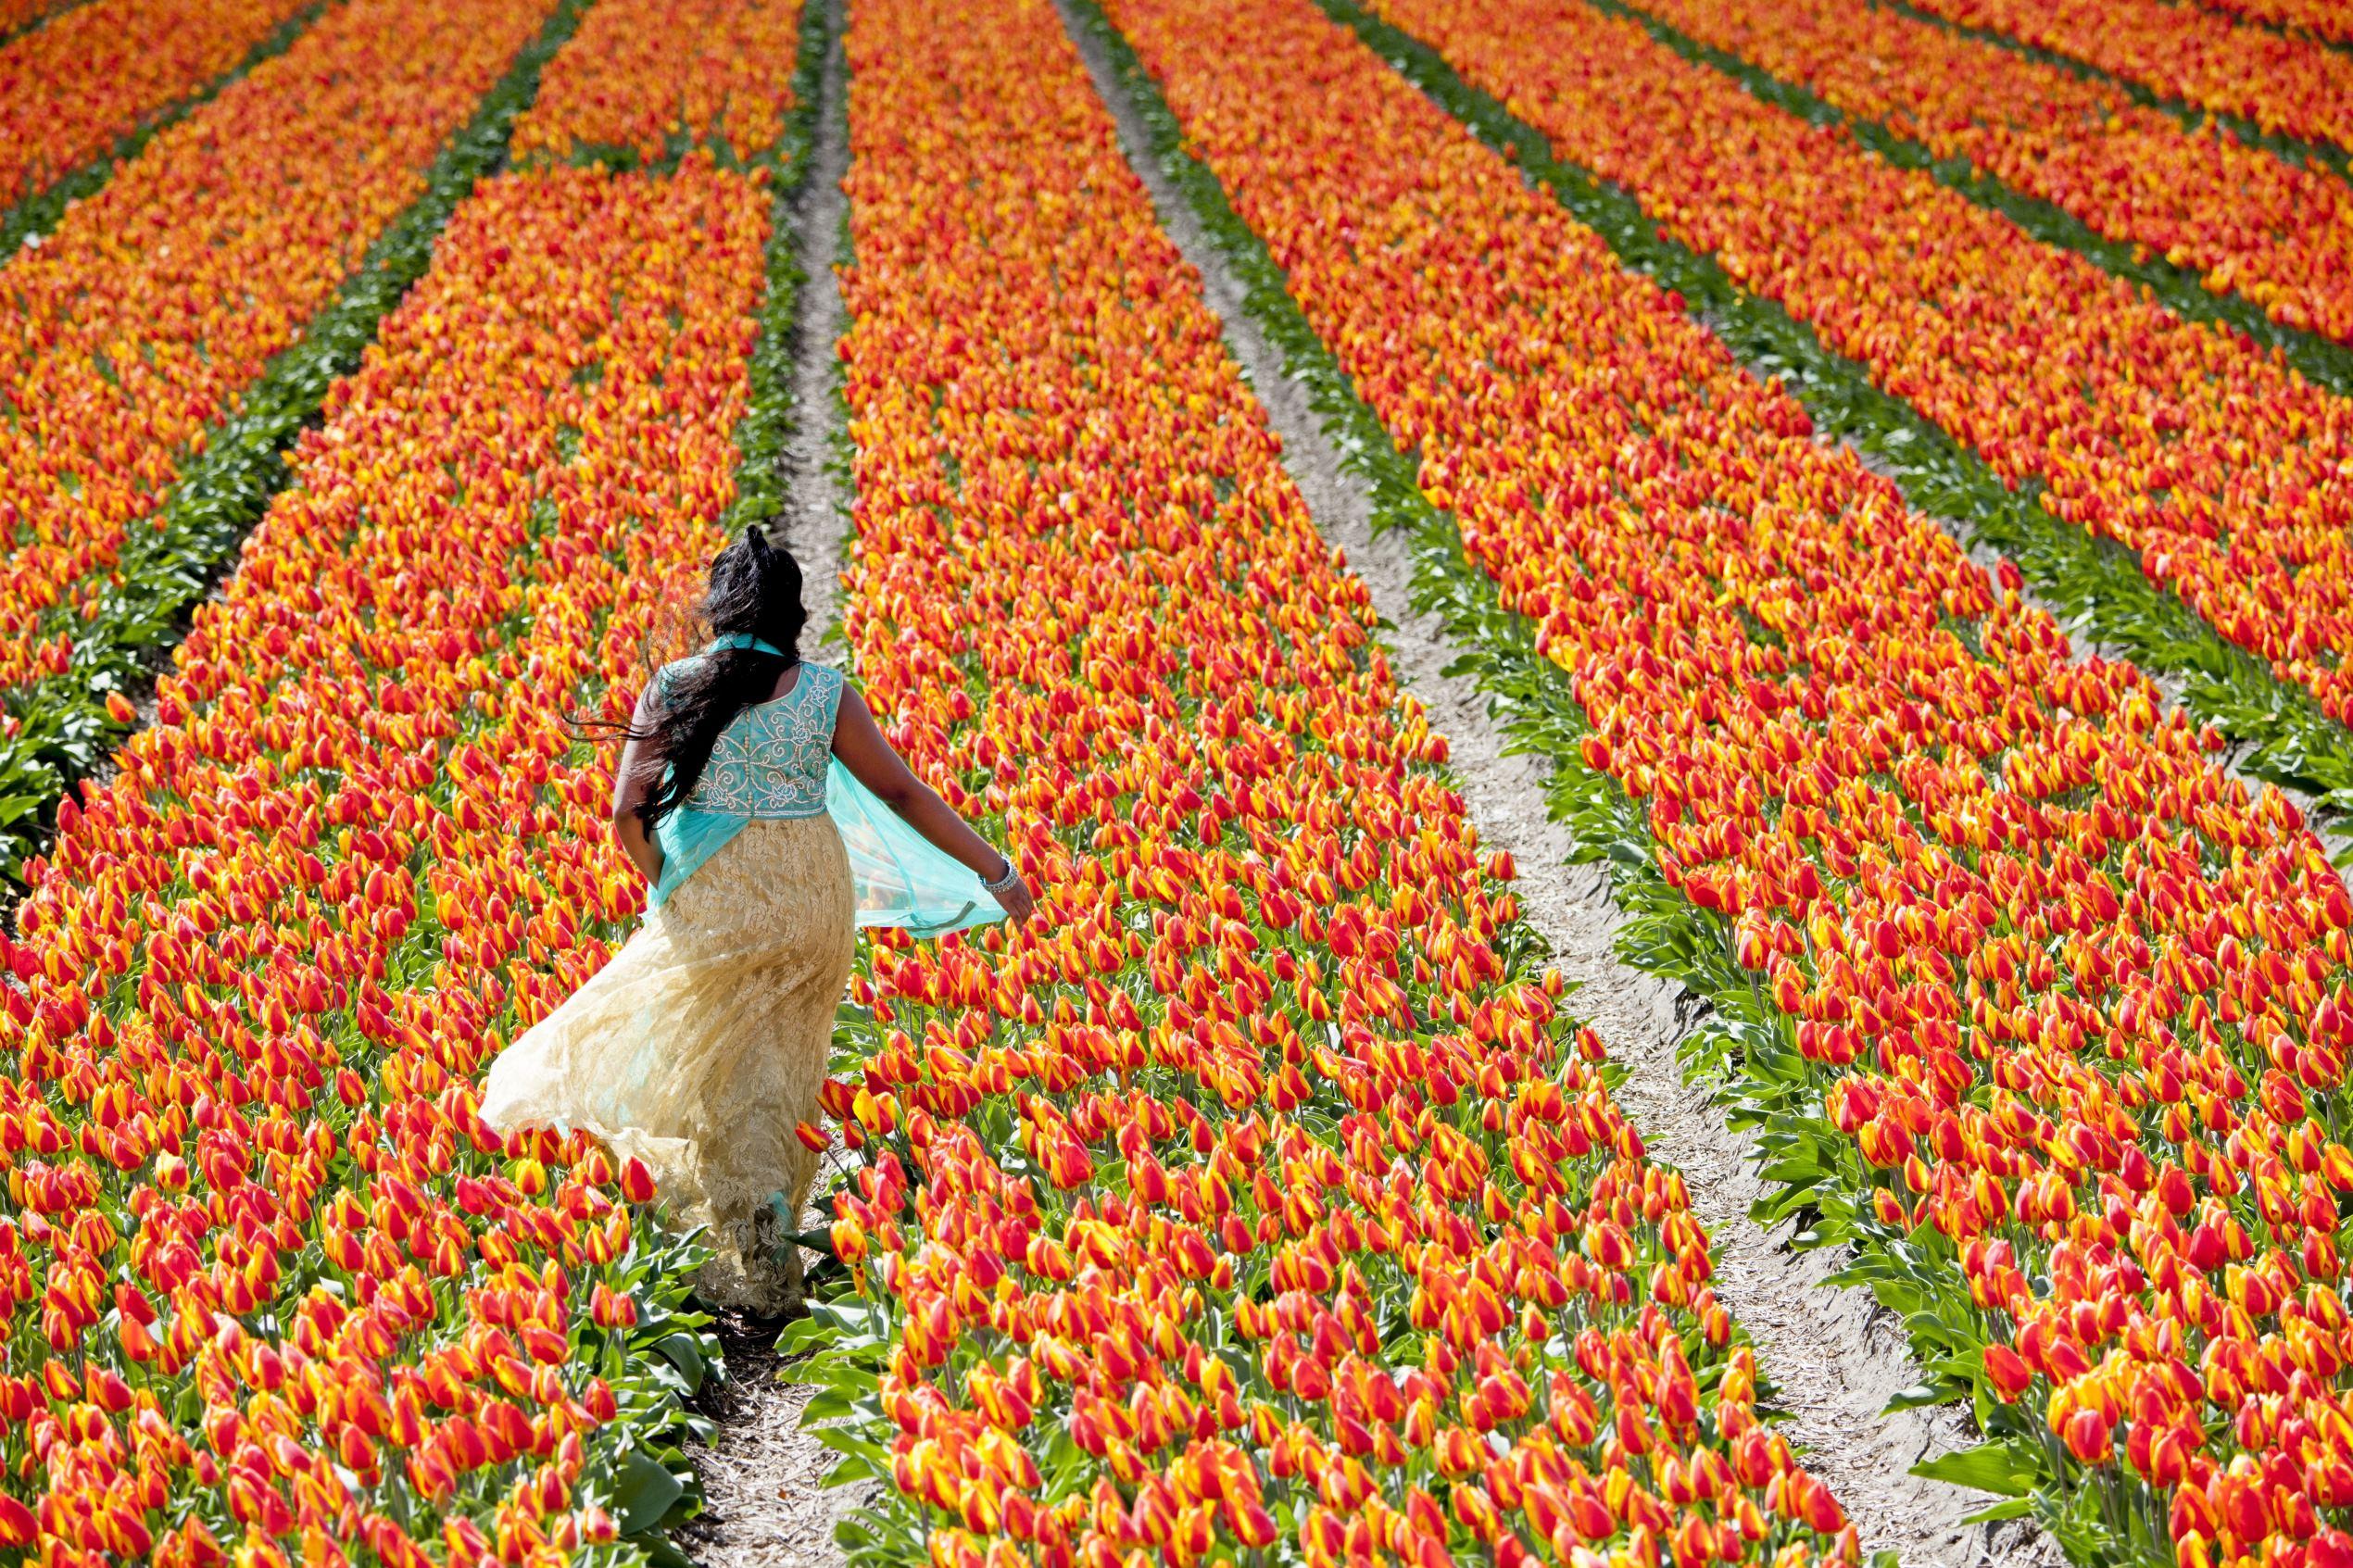 Слайд 41 из 86: Tulip flower fields, Lisse, Netherlands - 24 Apr 2016 Tulip flower fields, Lisse